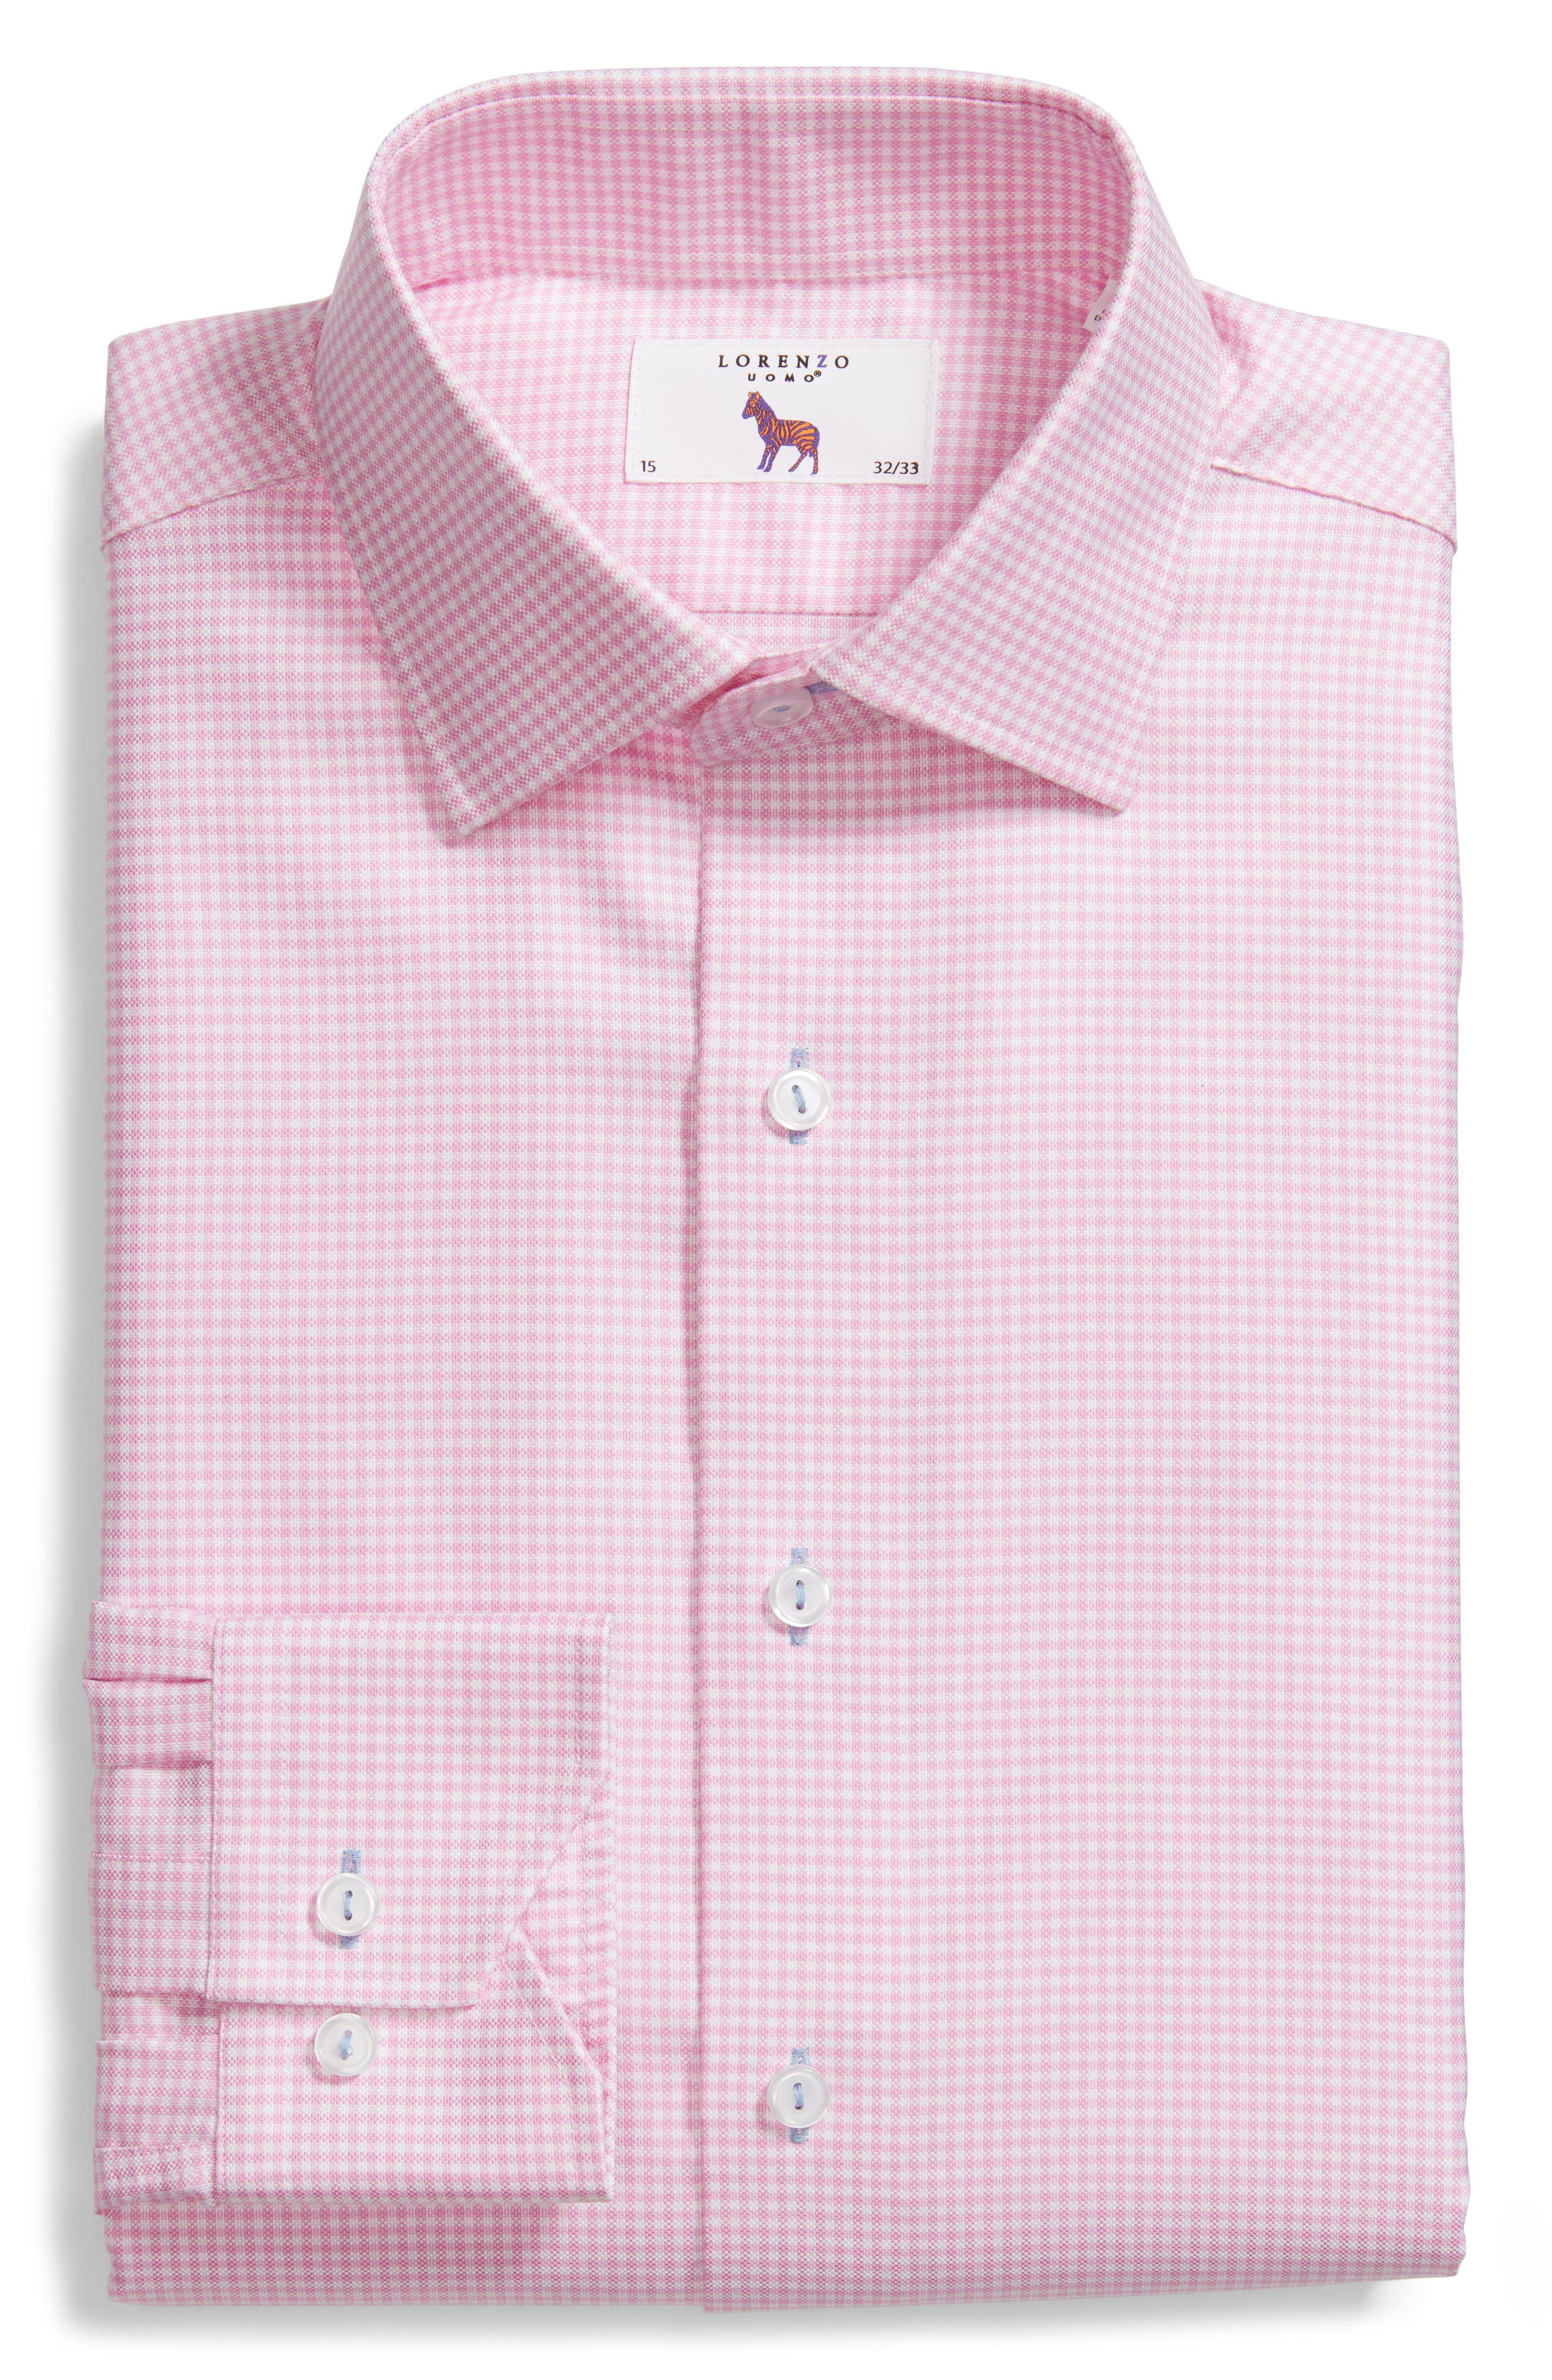 Trim Fit Textured Gingham Dress Shirt,                             Alternate thumbnail 6, color,                             Pink